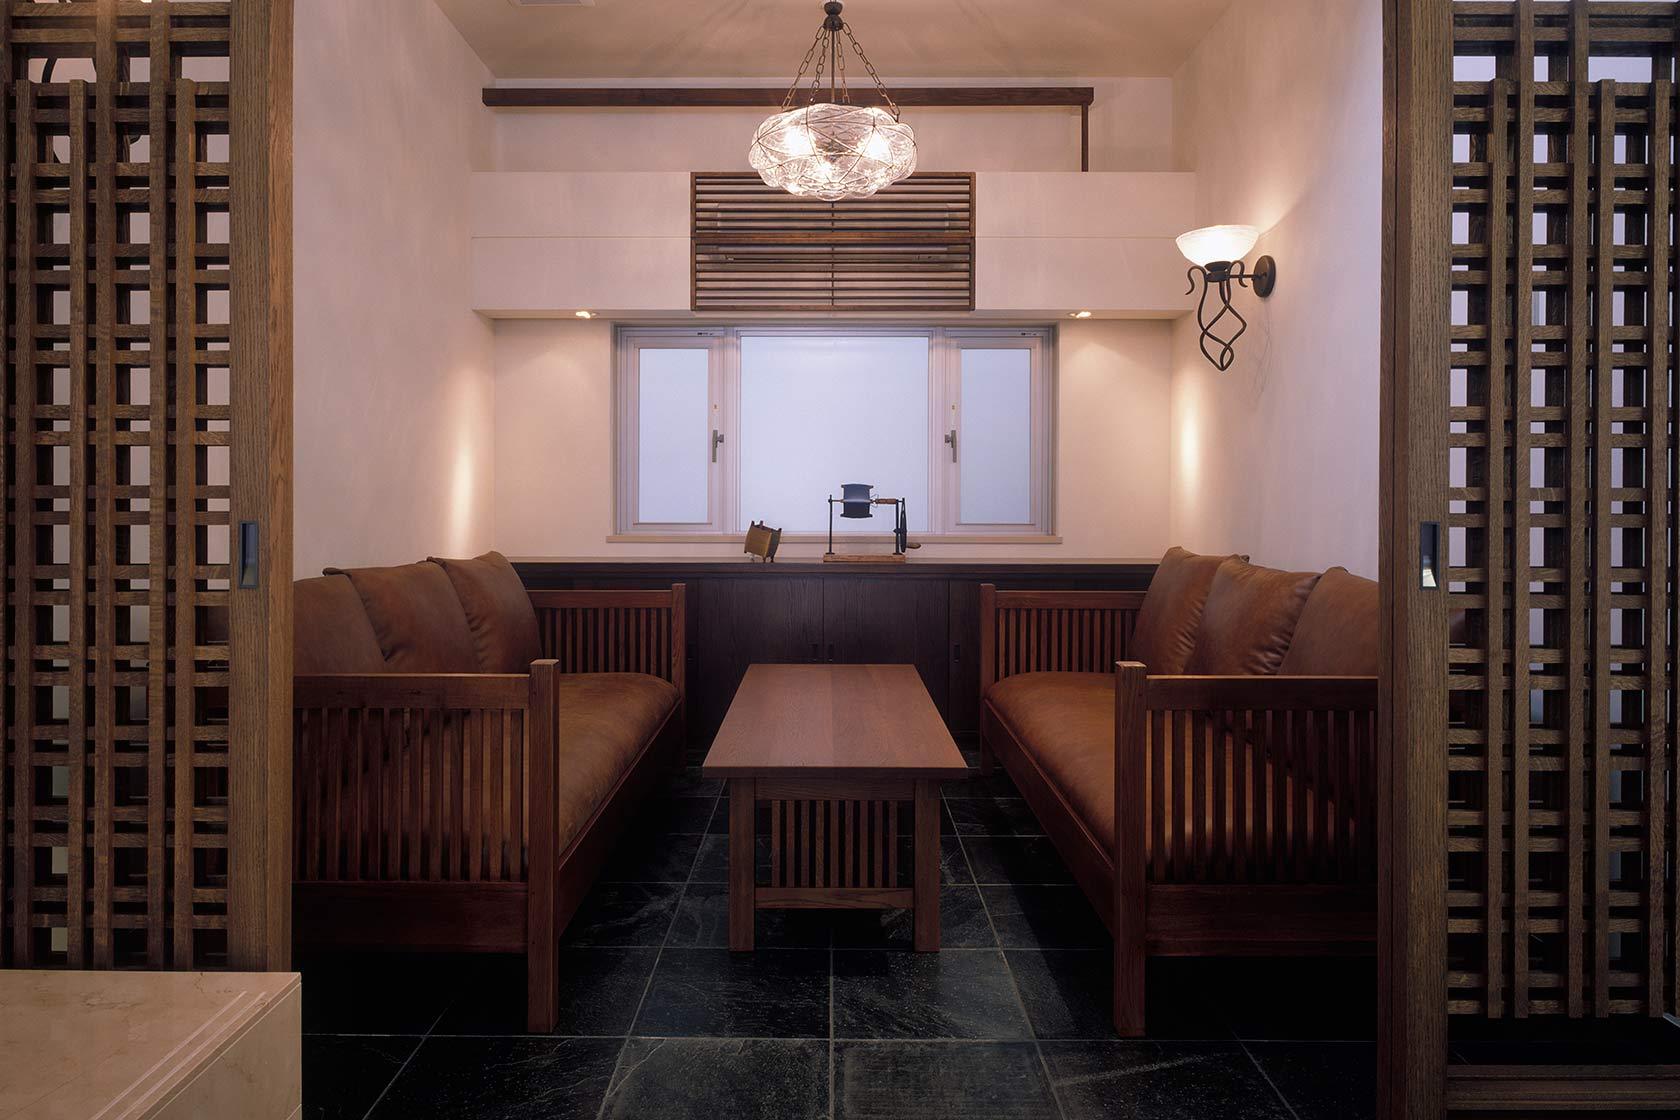 K織物株式会社+K邸13-打合せスペース